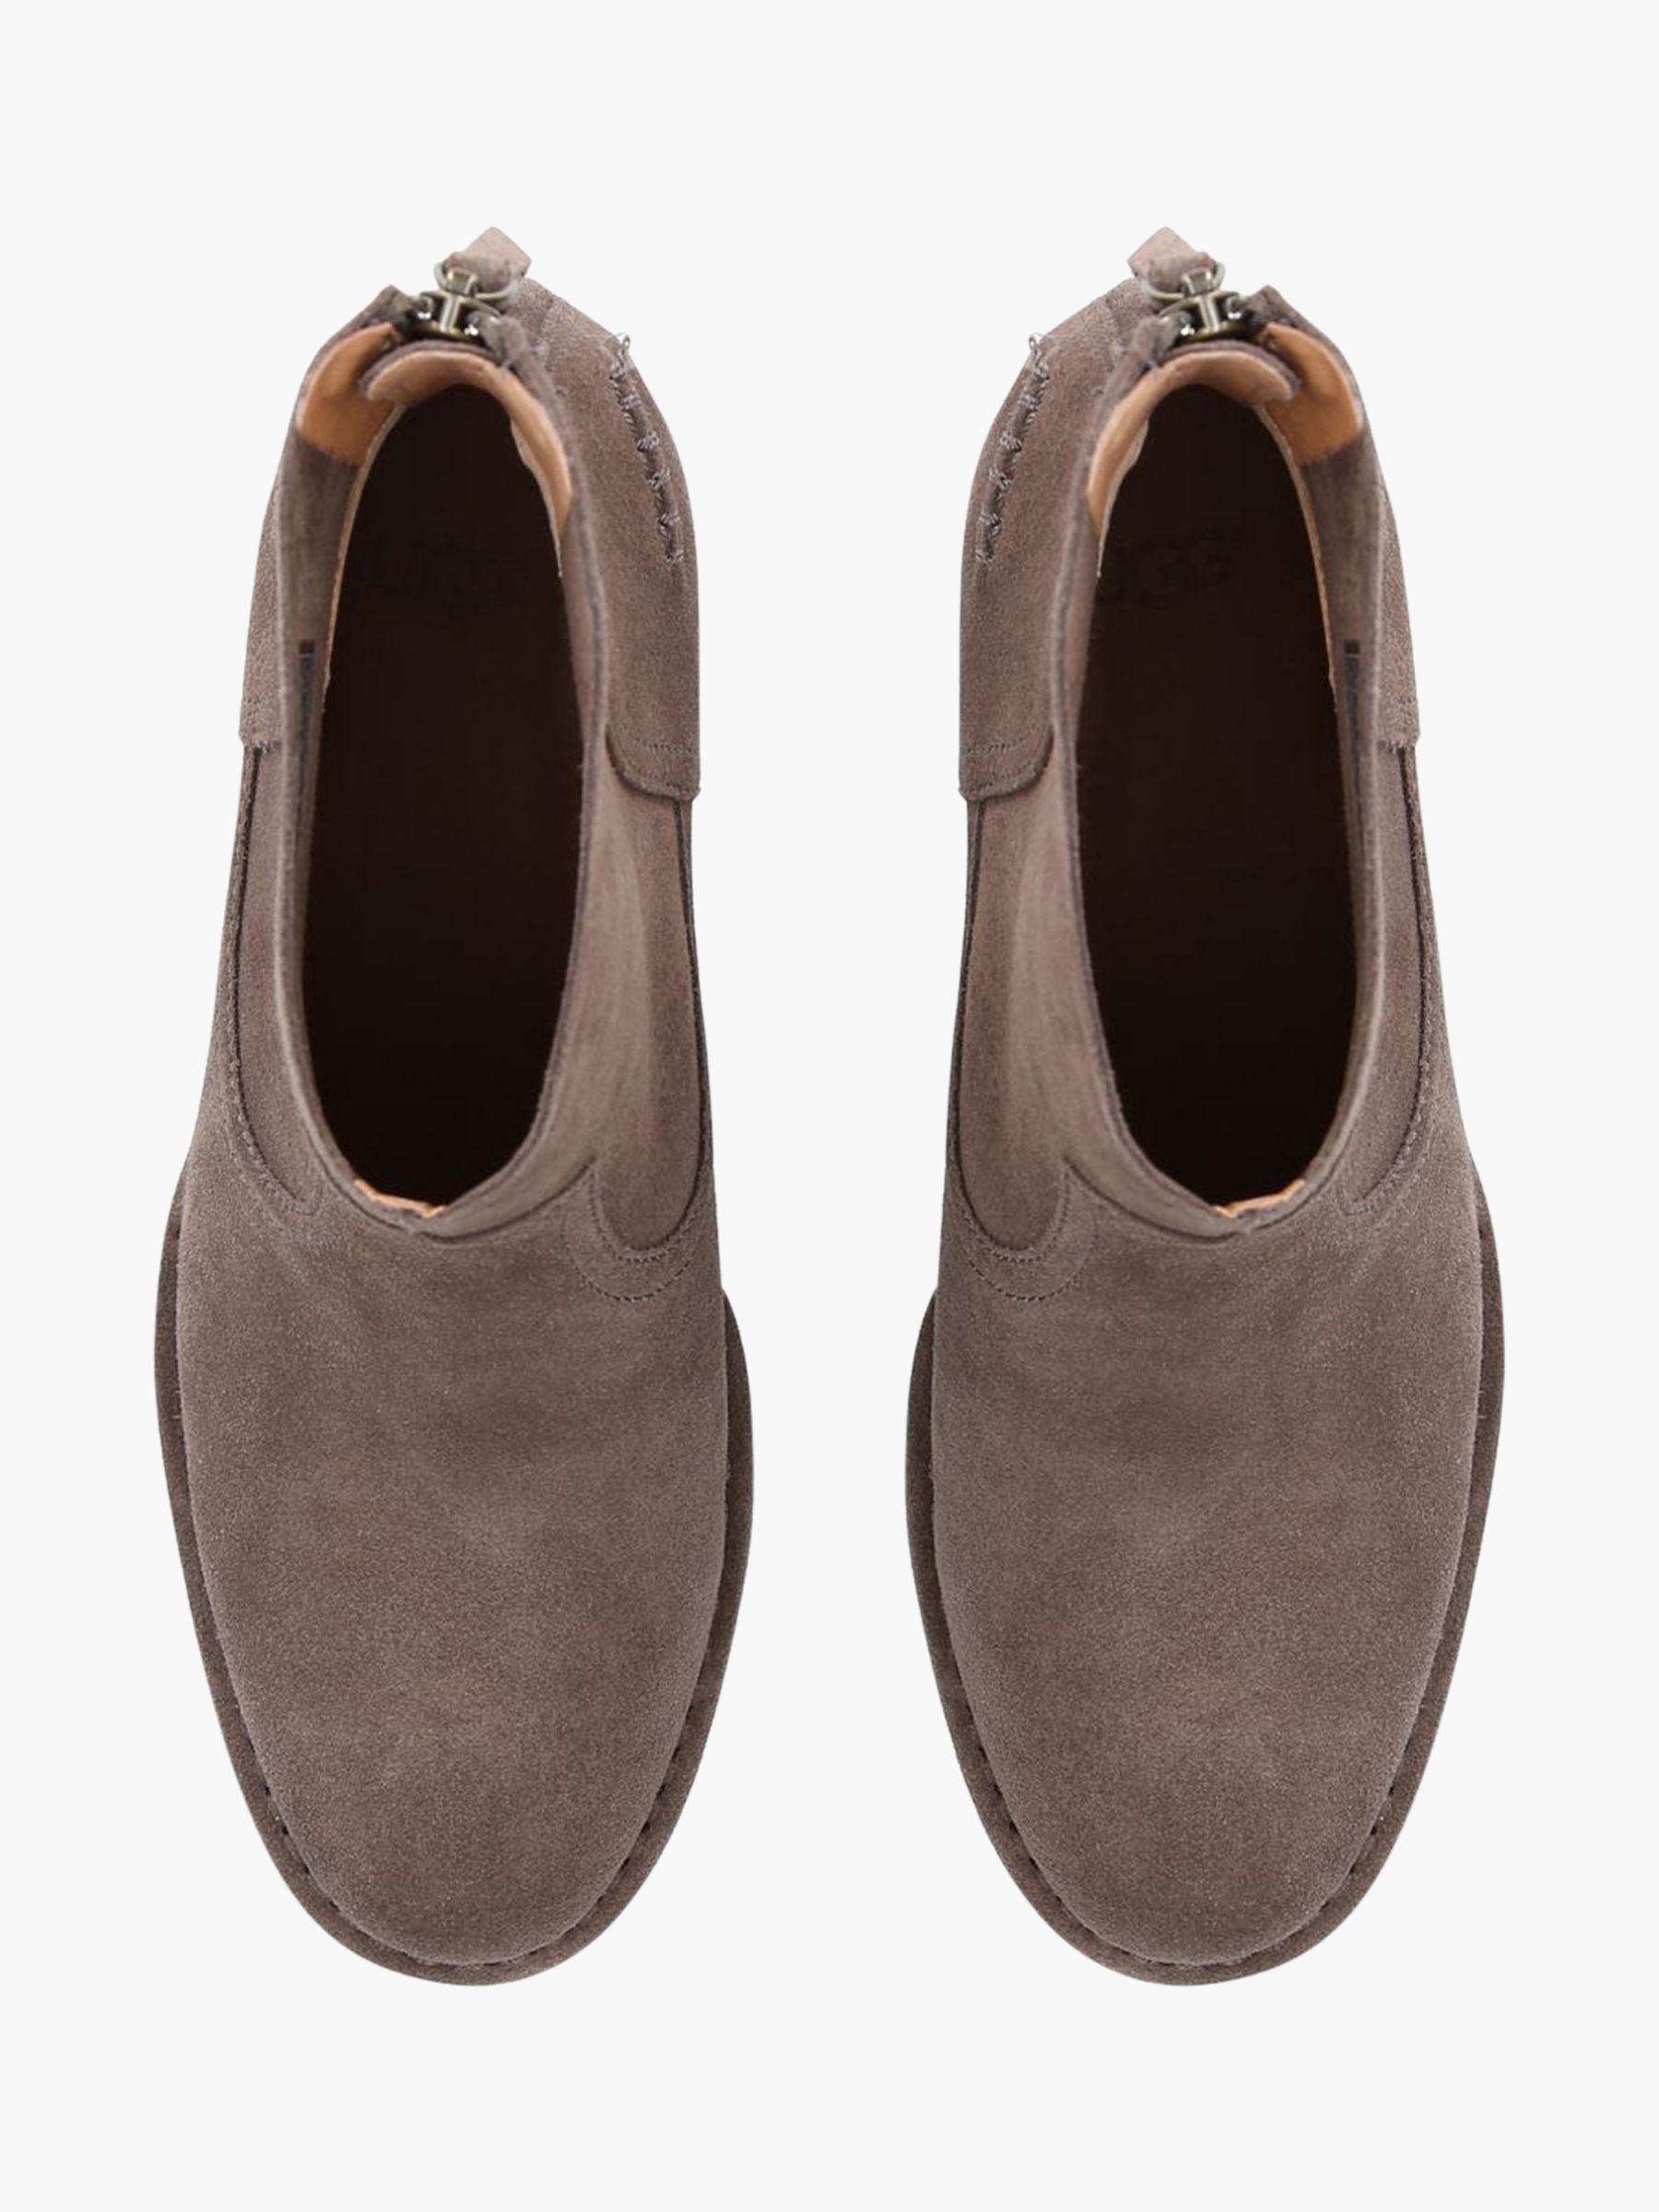 452defb2c8b UGG Bandara Block Heel Ankle Boots in Brown - Lyst